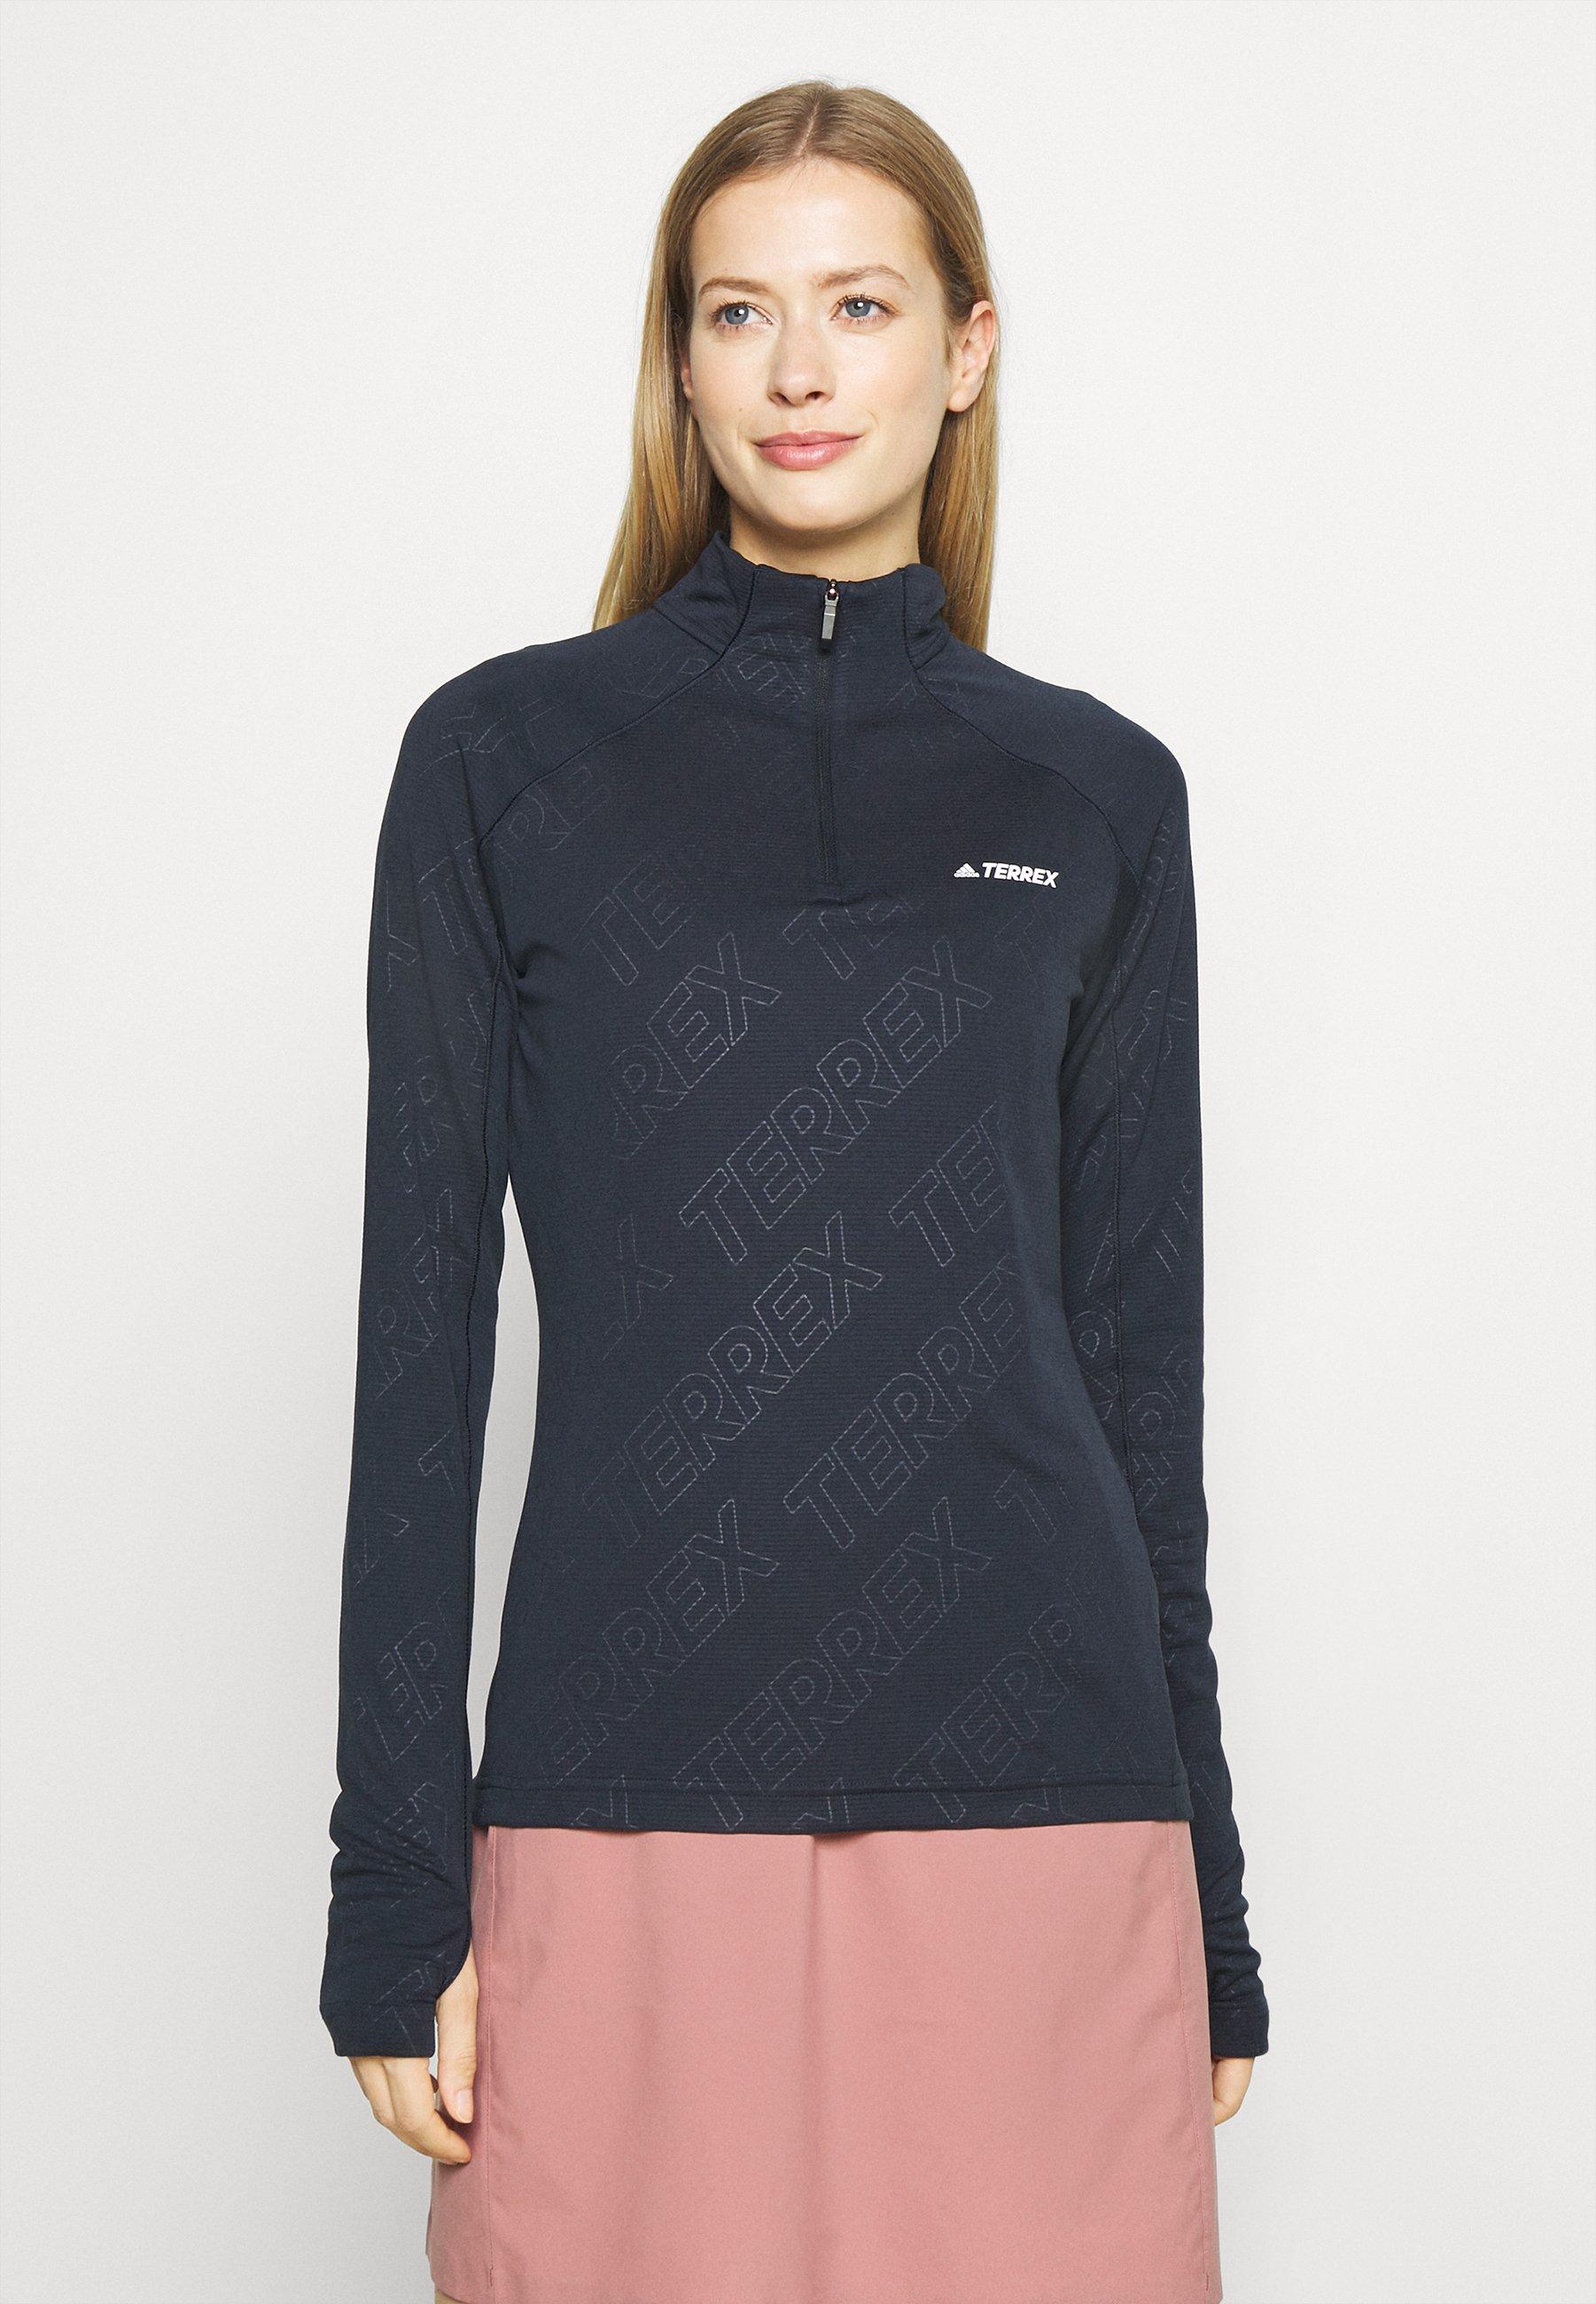 Femme TRACE ROCKER ZIP TECHNICAL AEROREADY - T-shirt à manches longues